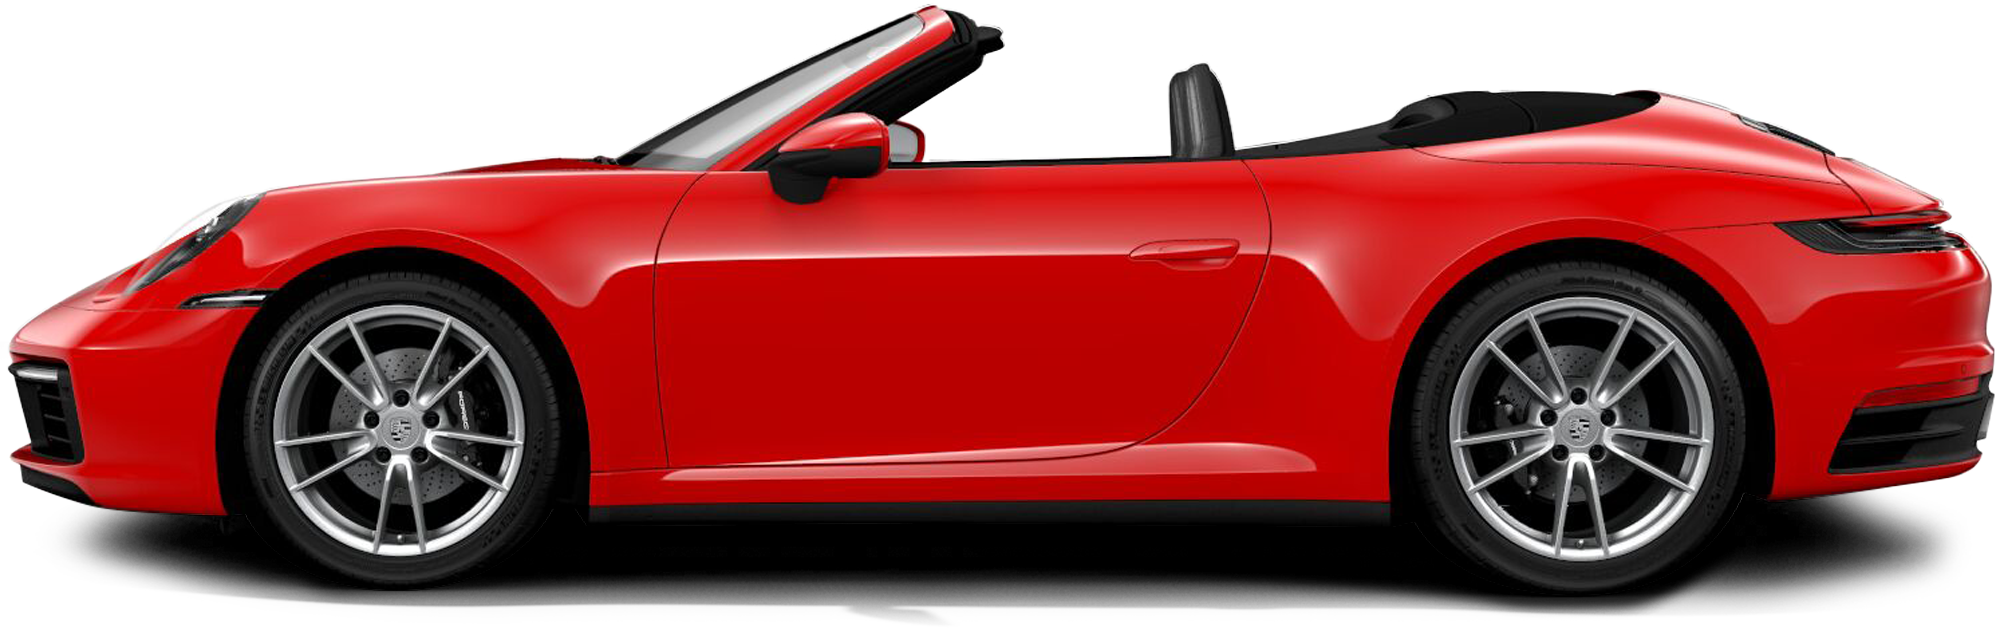 2022 Porsche 911 Cabriolet Carrera